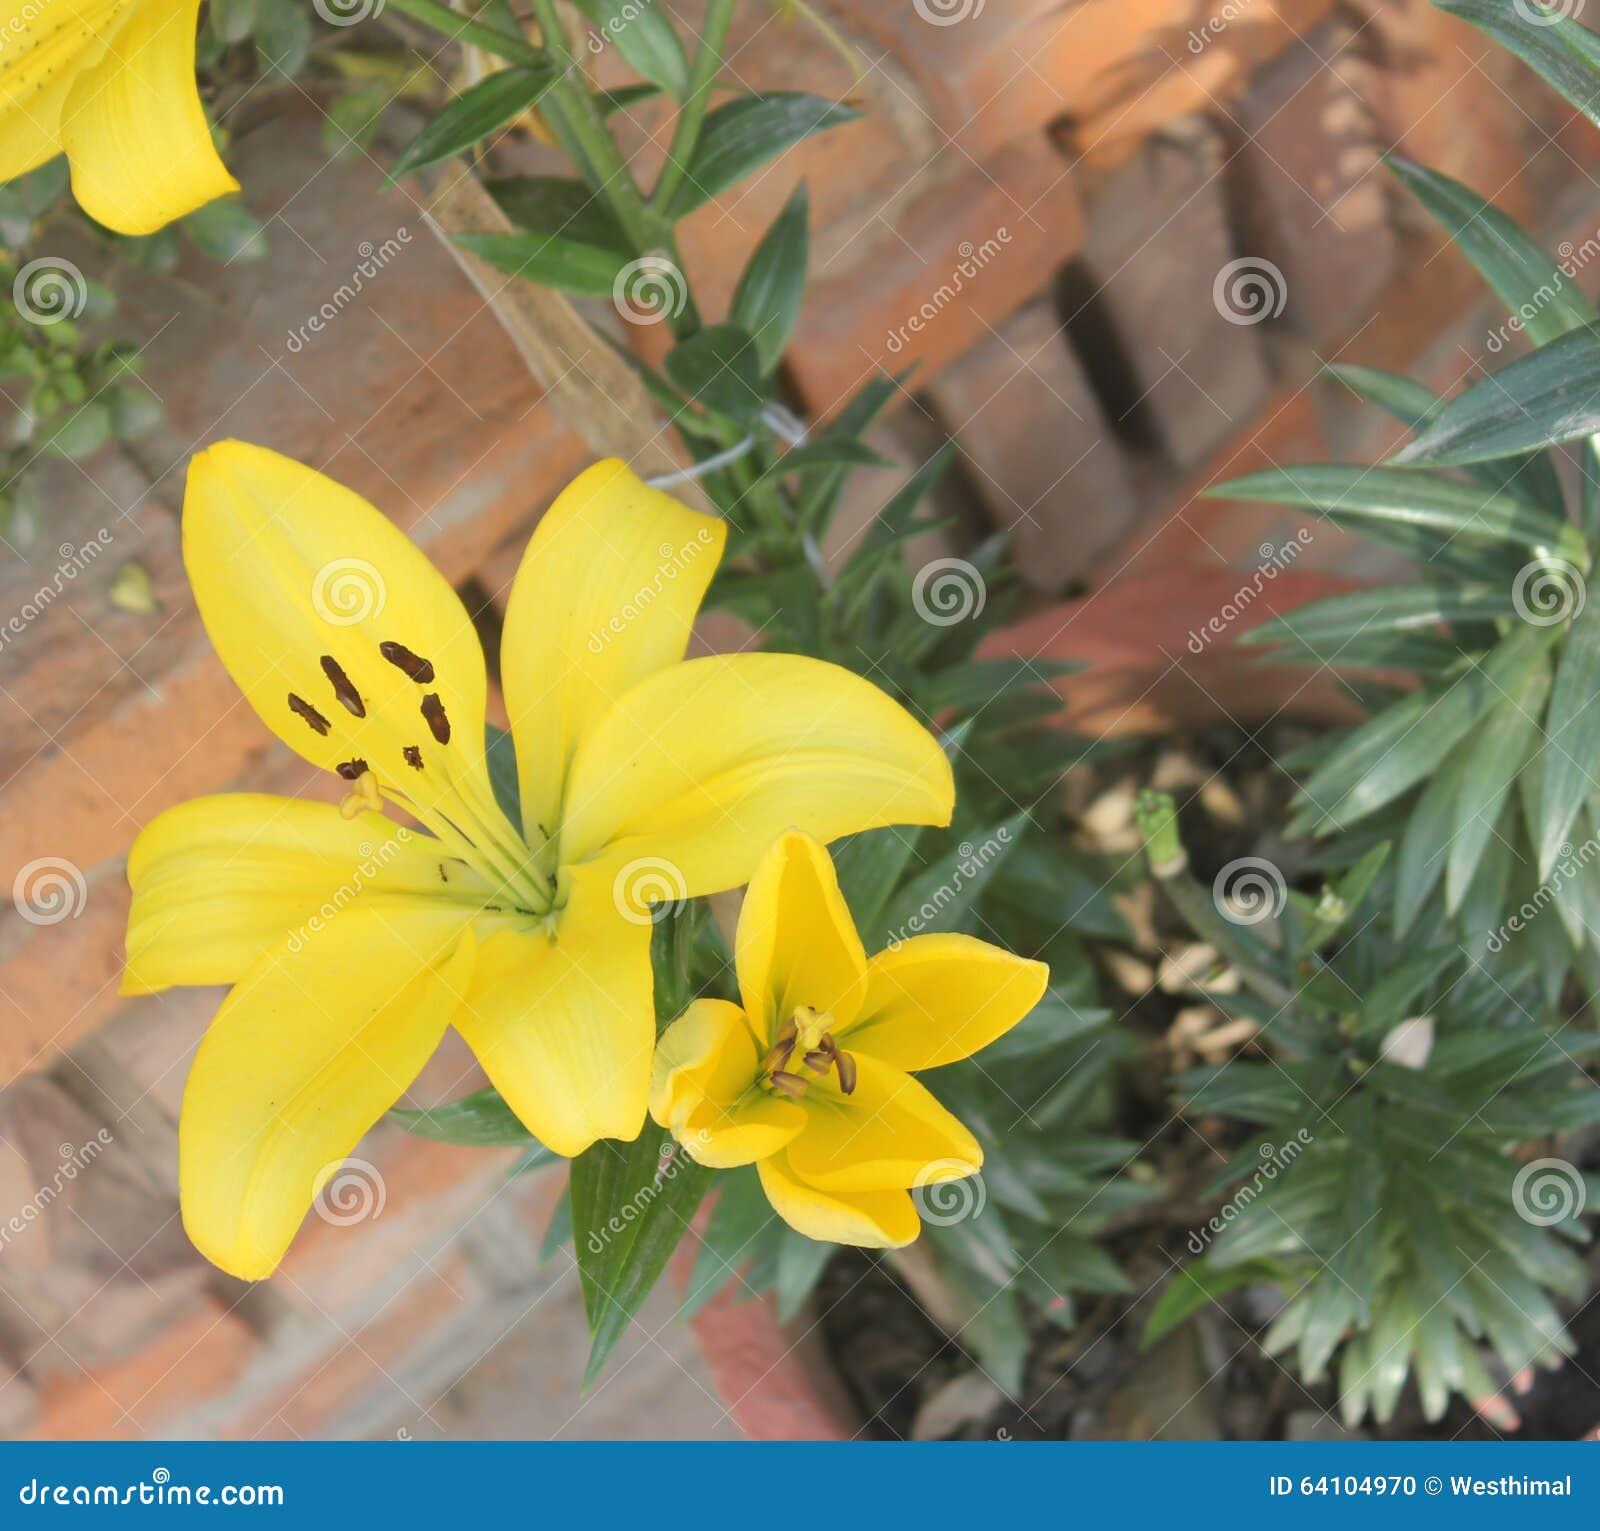 Lilium Yellow Lily Stock Photo Image Of Plant Popular 64104970